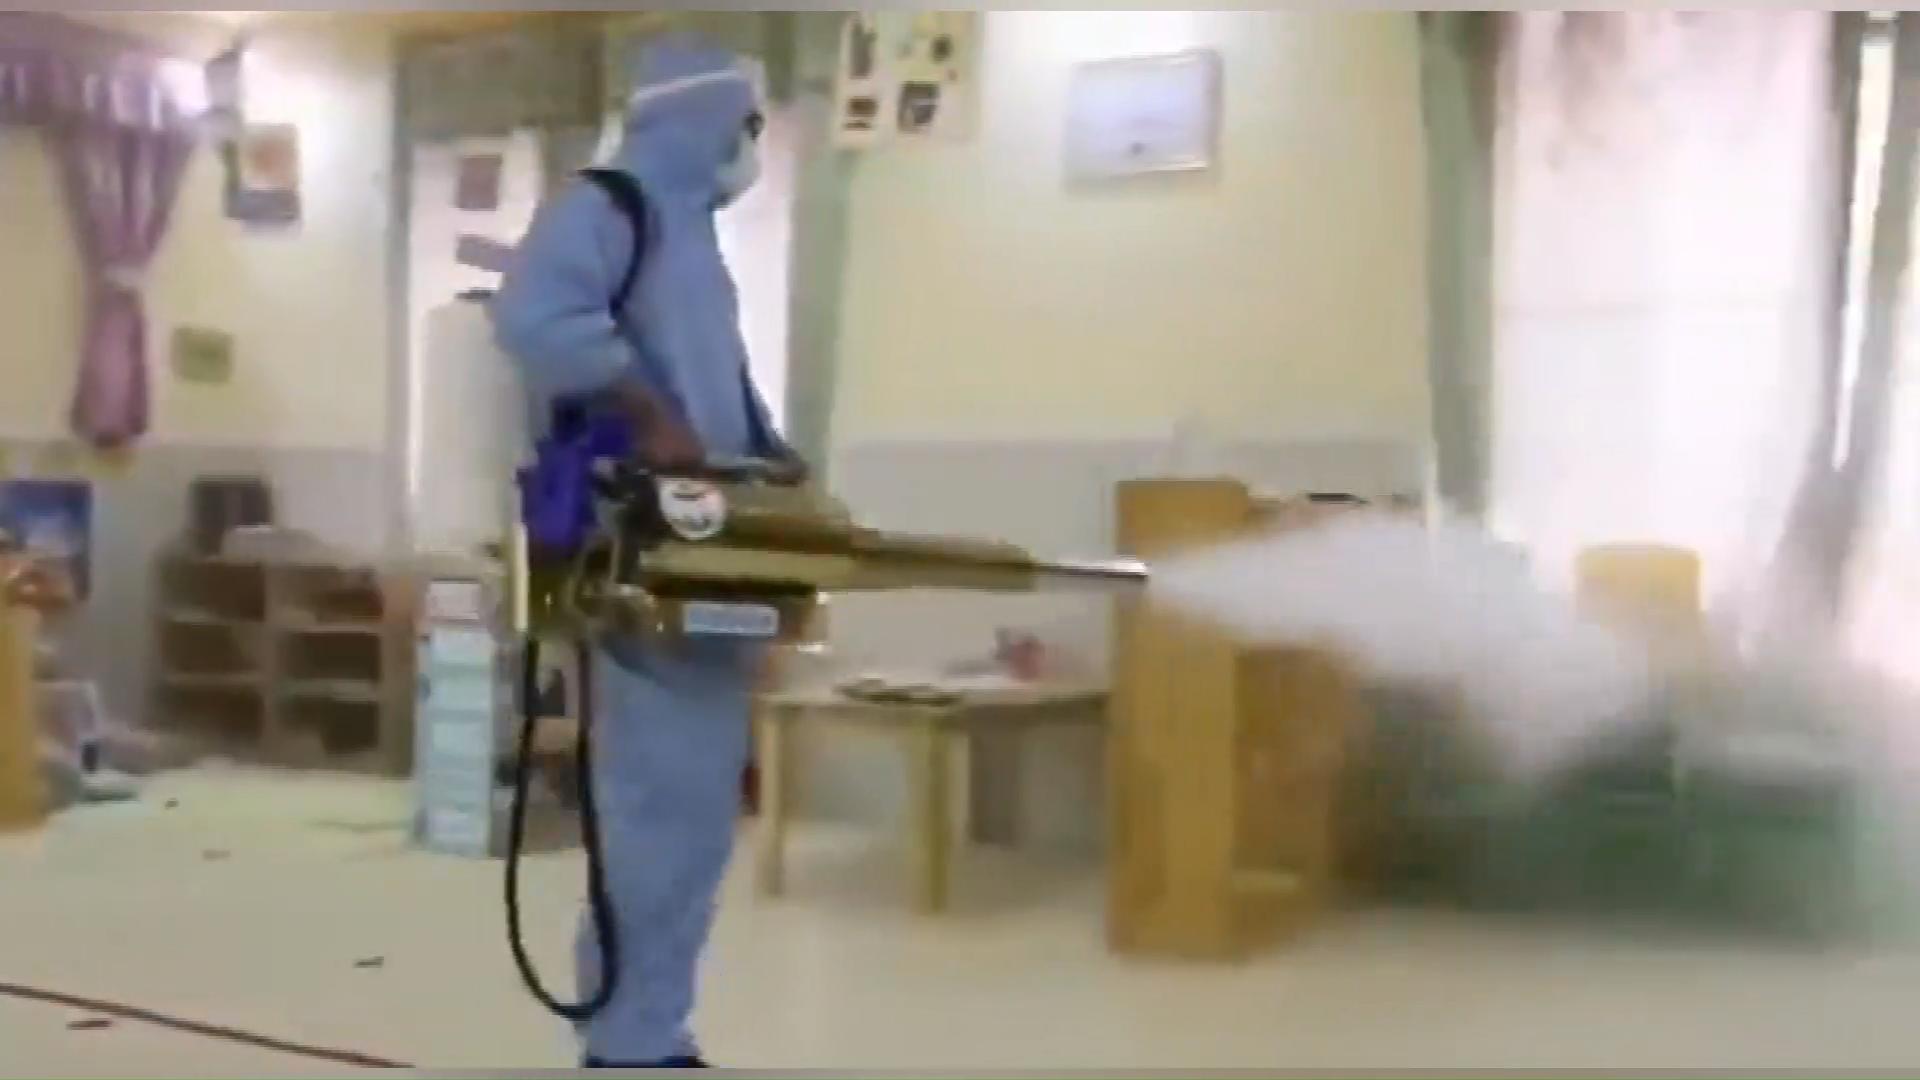 Ulv曇り熱噴霧器機械ポータブル電気熱噴霧器